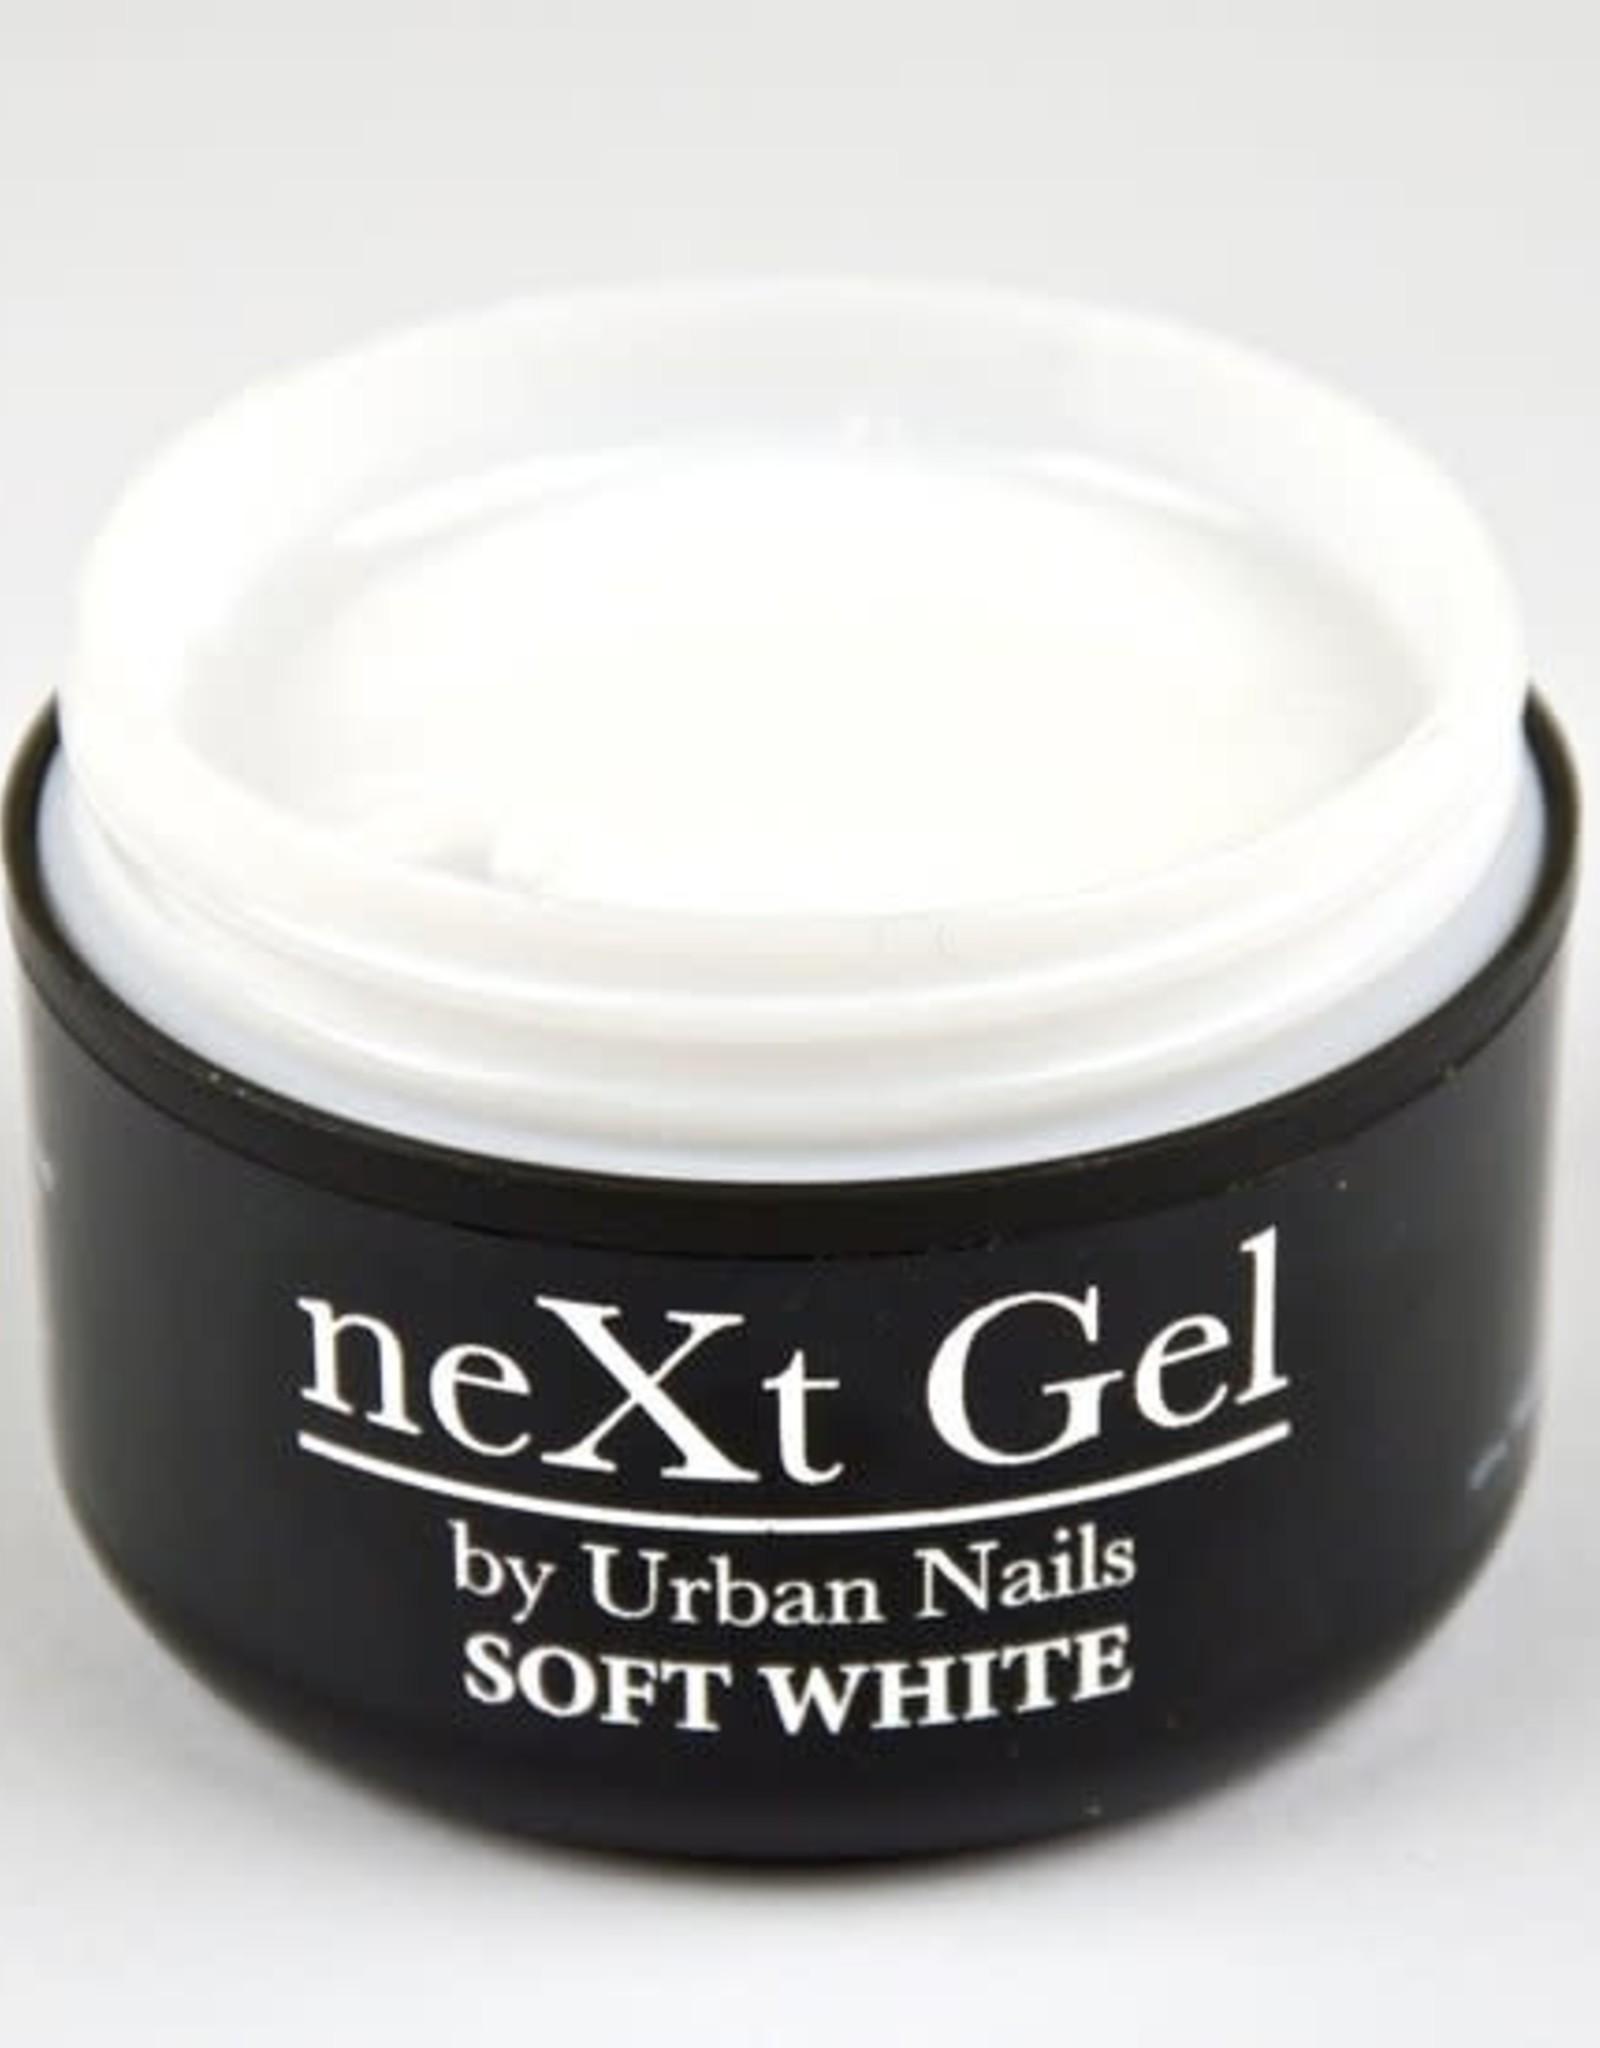 Urban Nails Next Gel Soft White